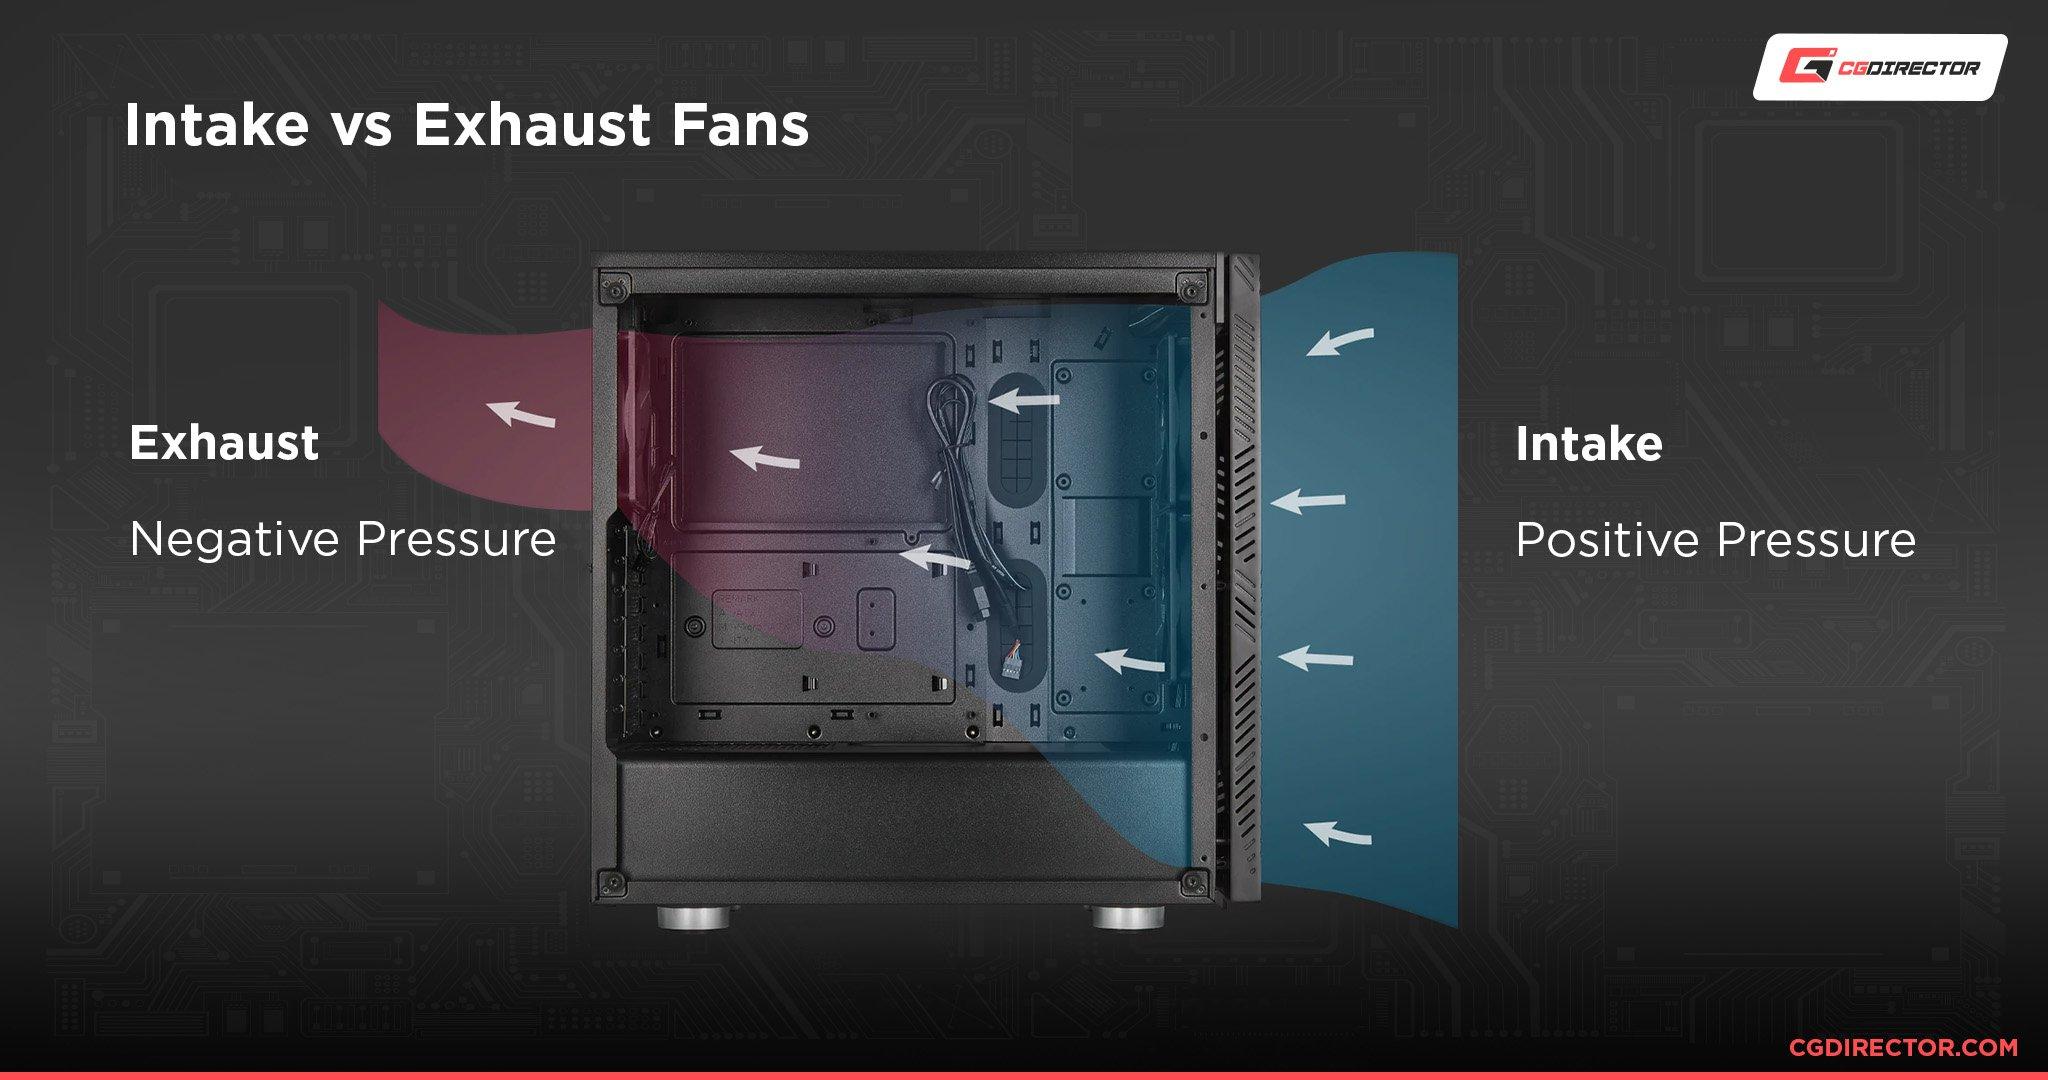 Intake vs Exhaust Fans